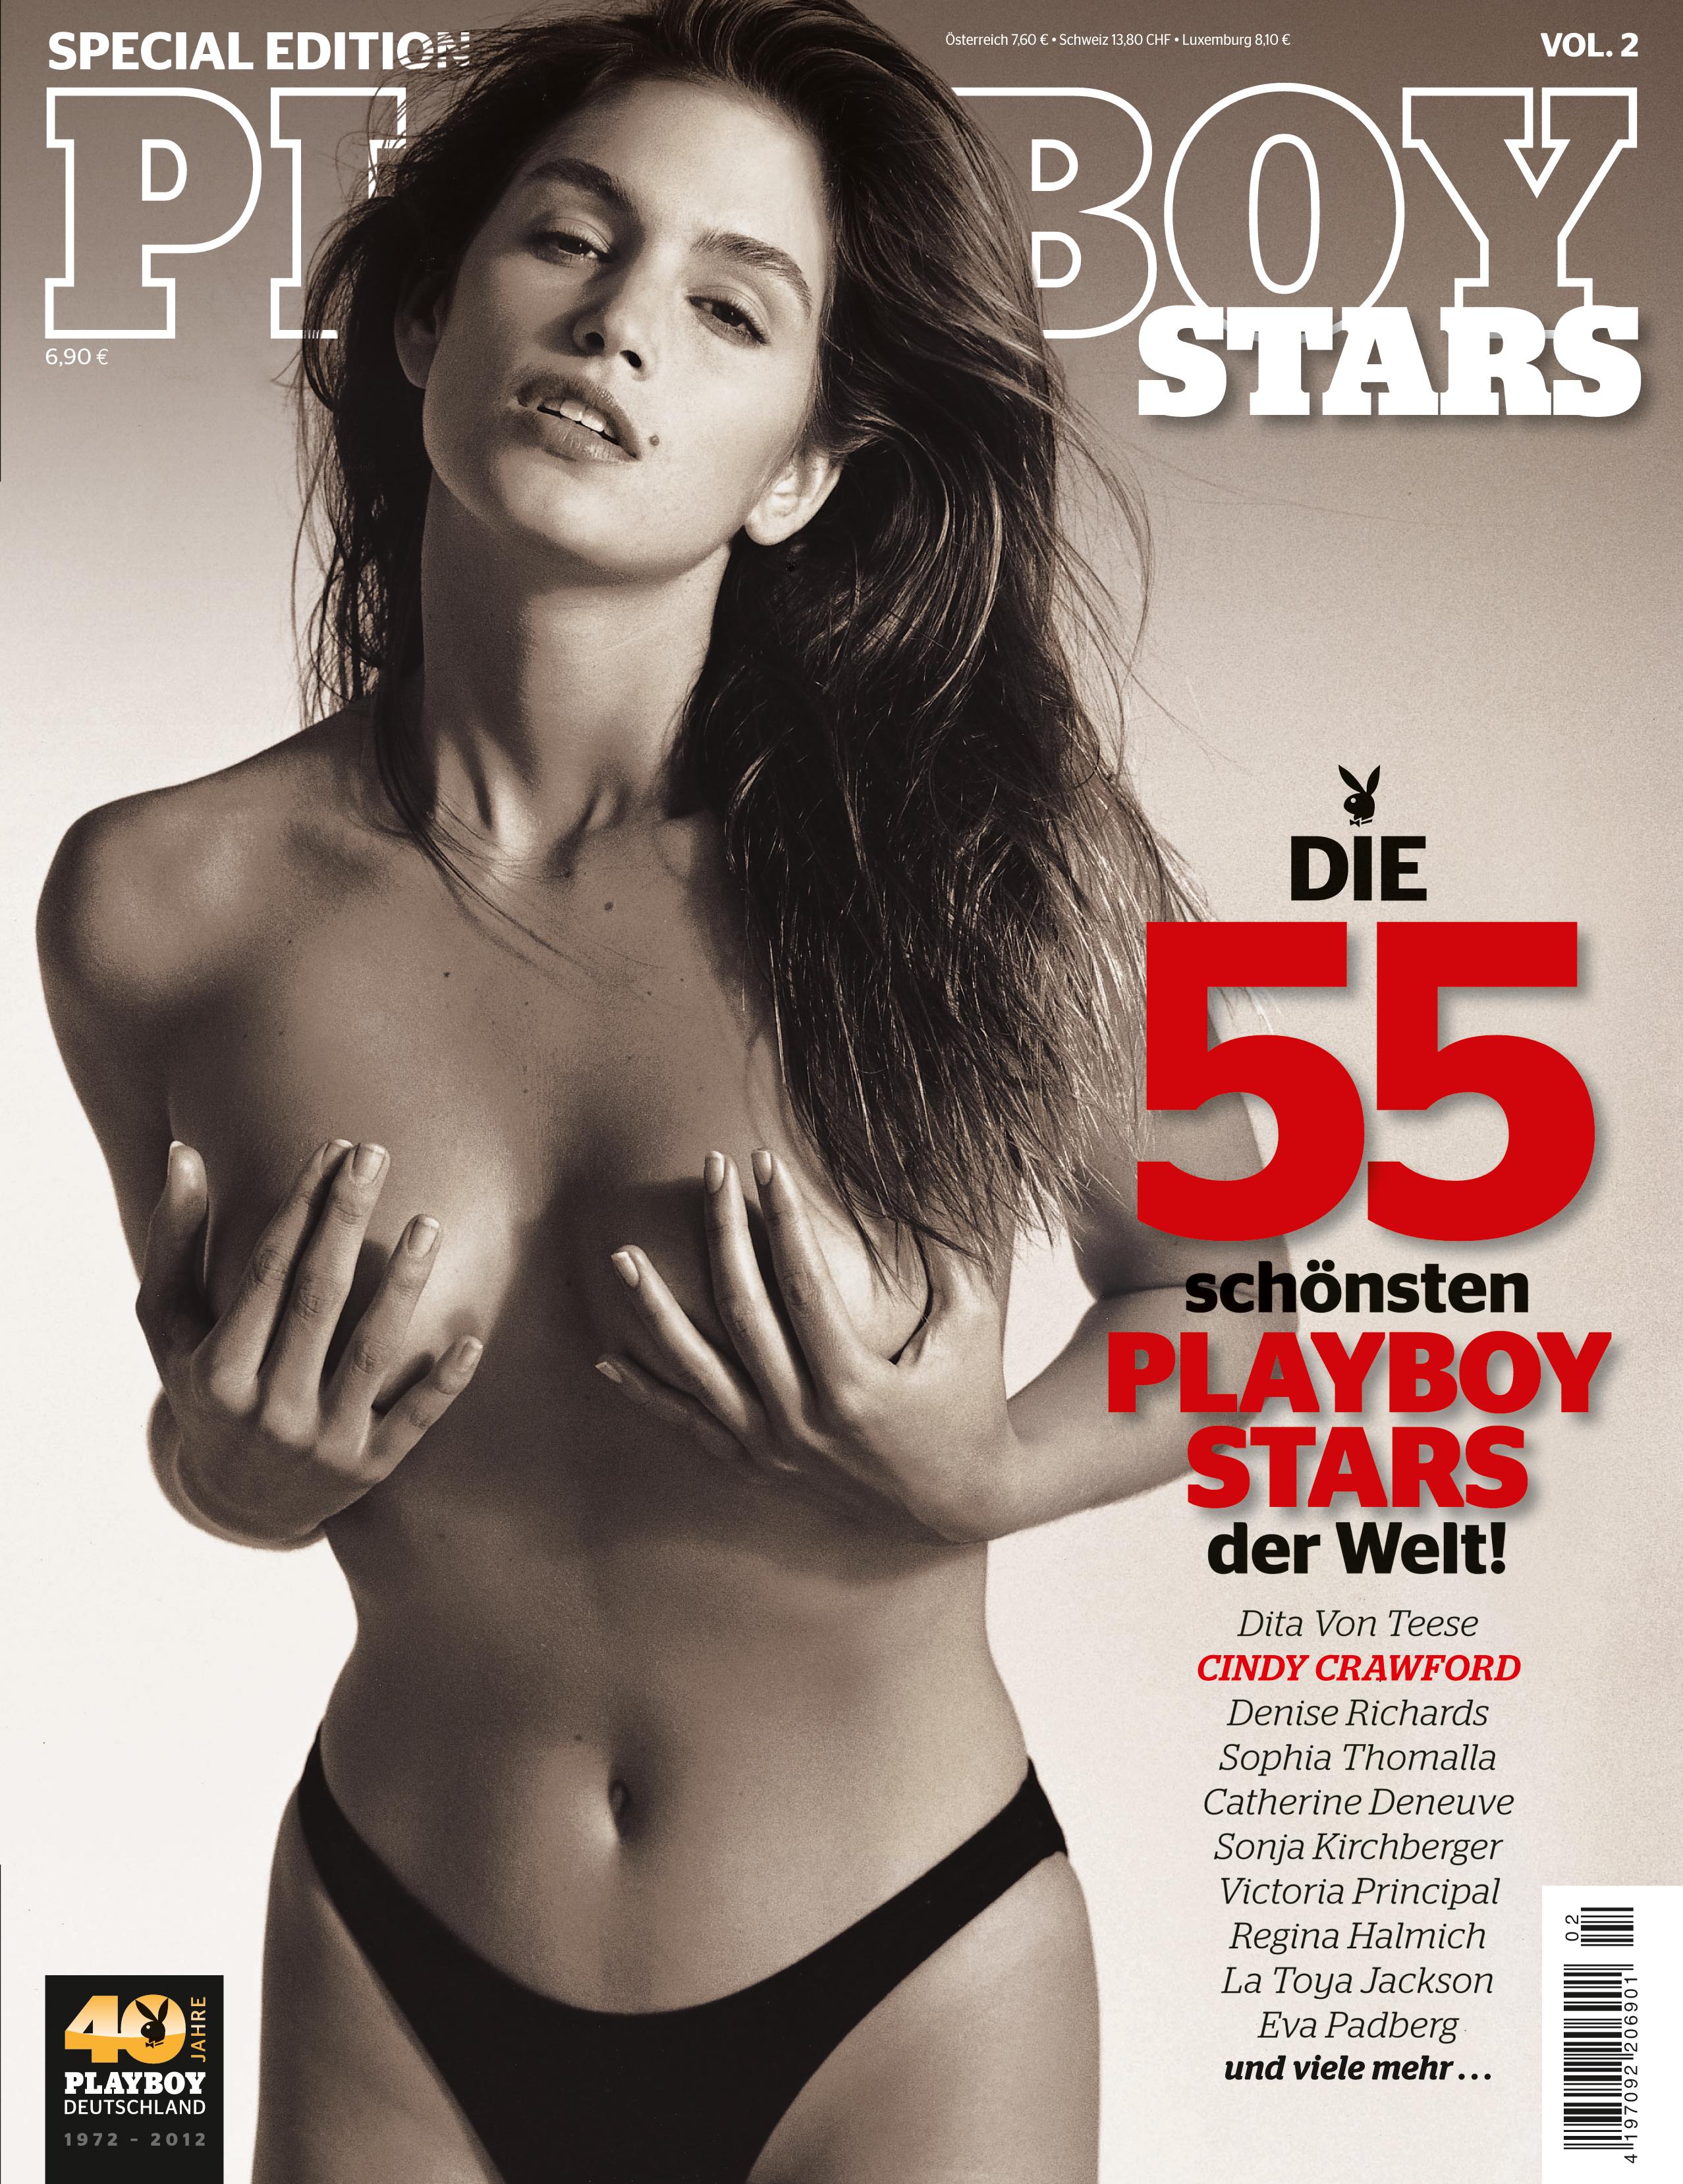 softporno titel münchen sexy